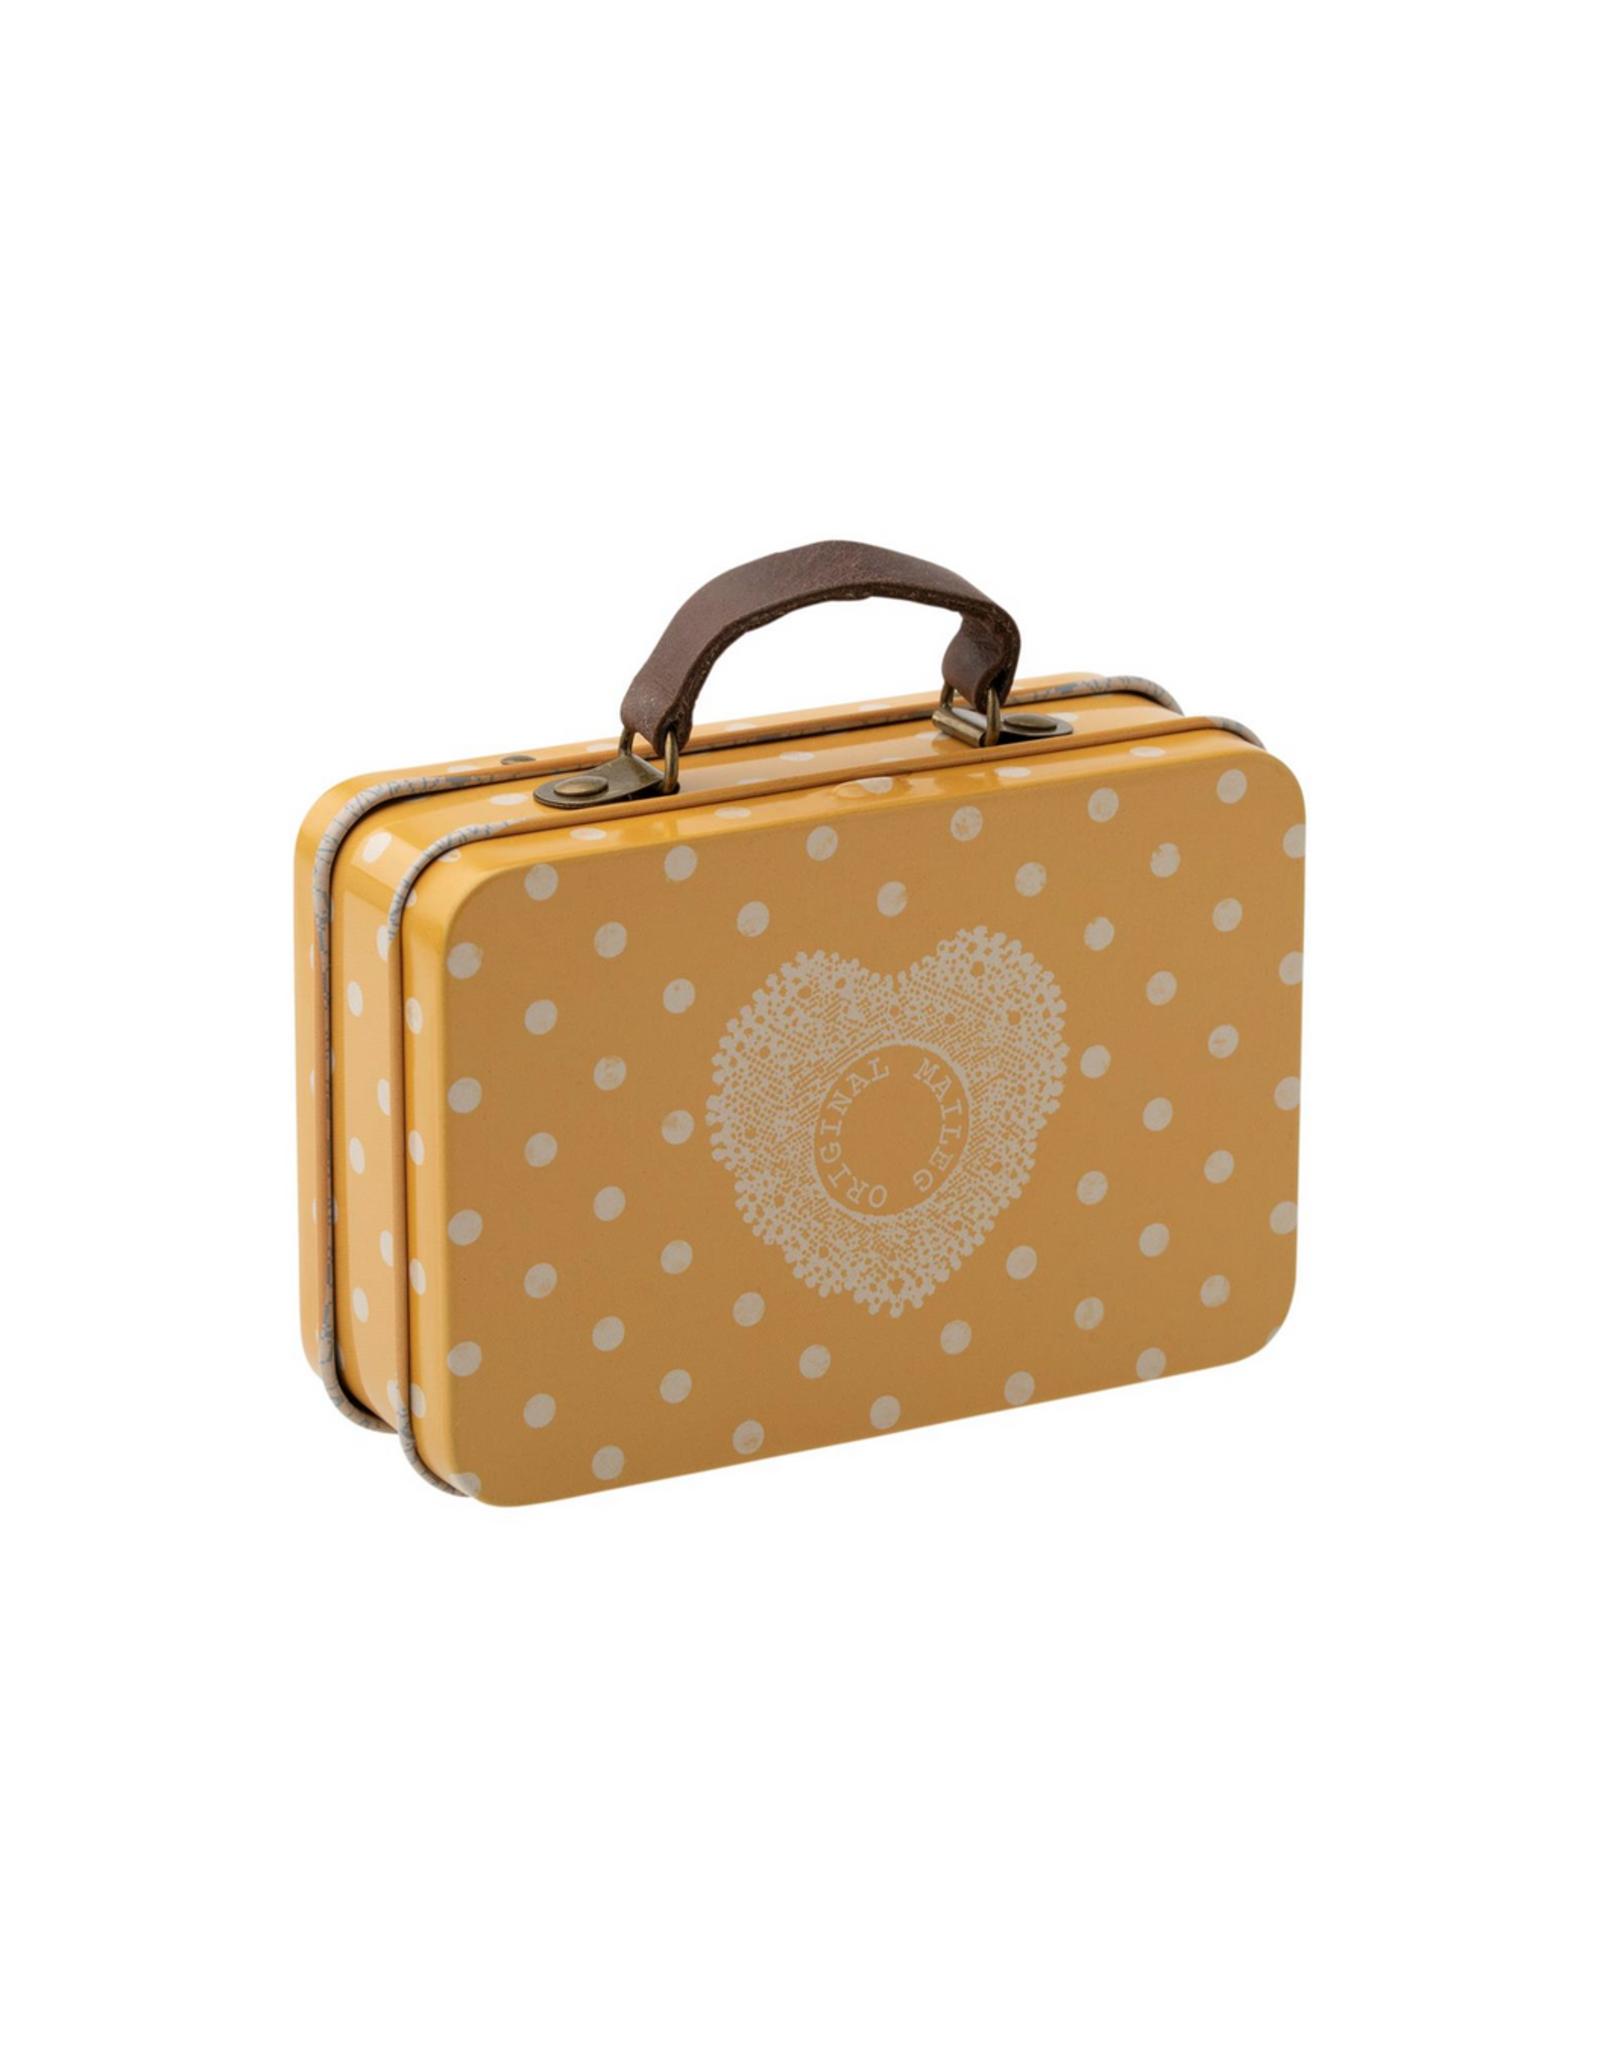 Maileg Metal Suitcase - Yellow + Cream Polkadots